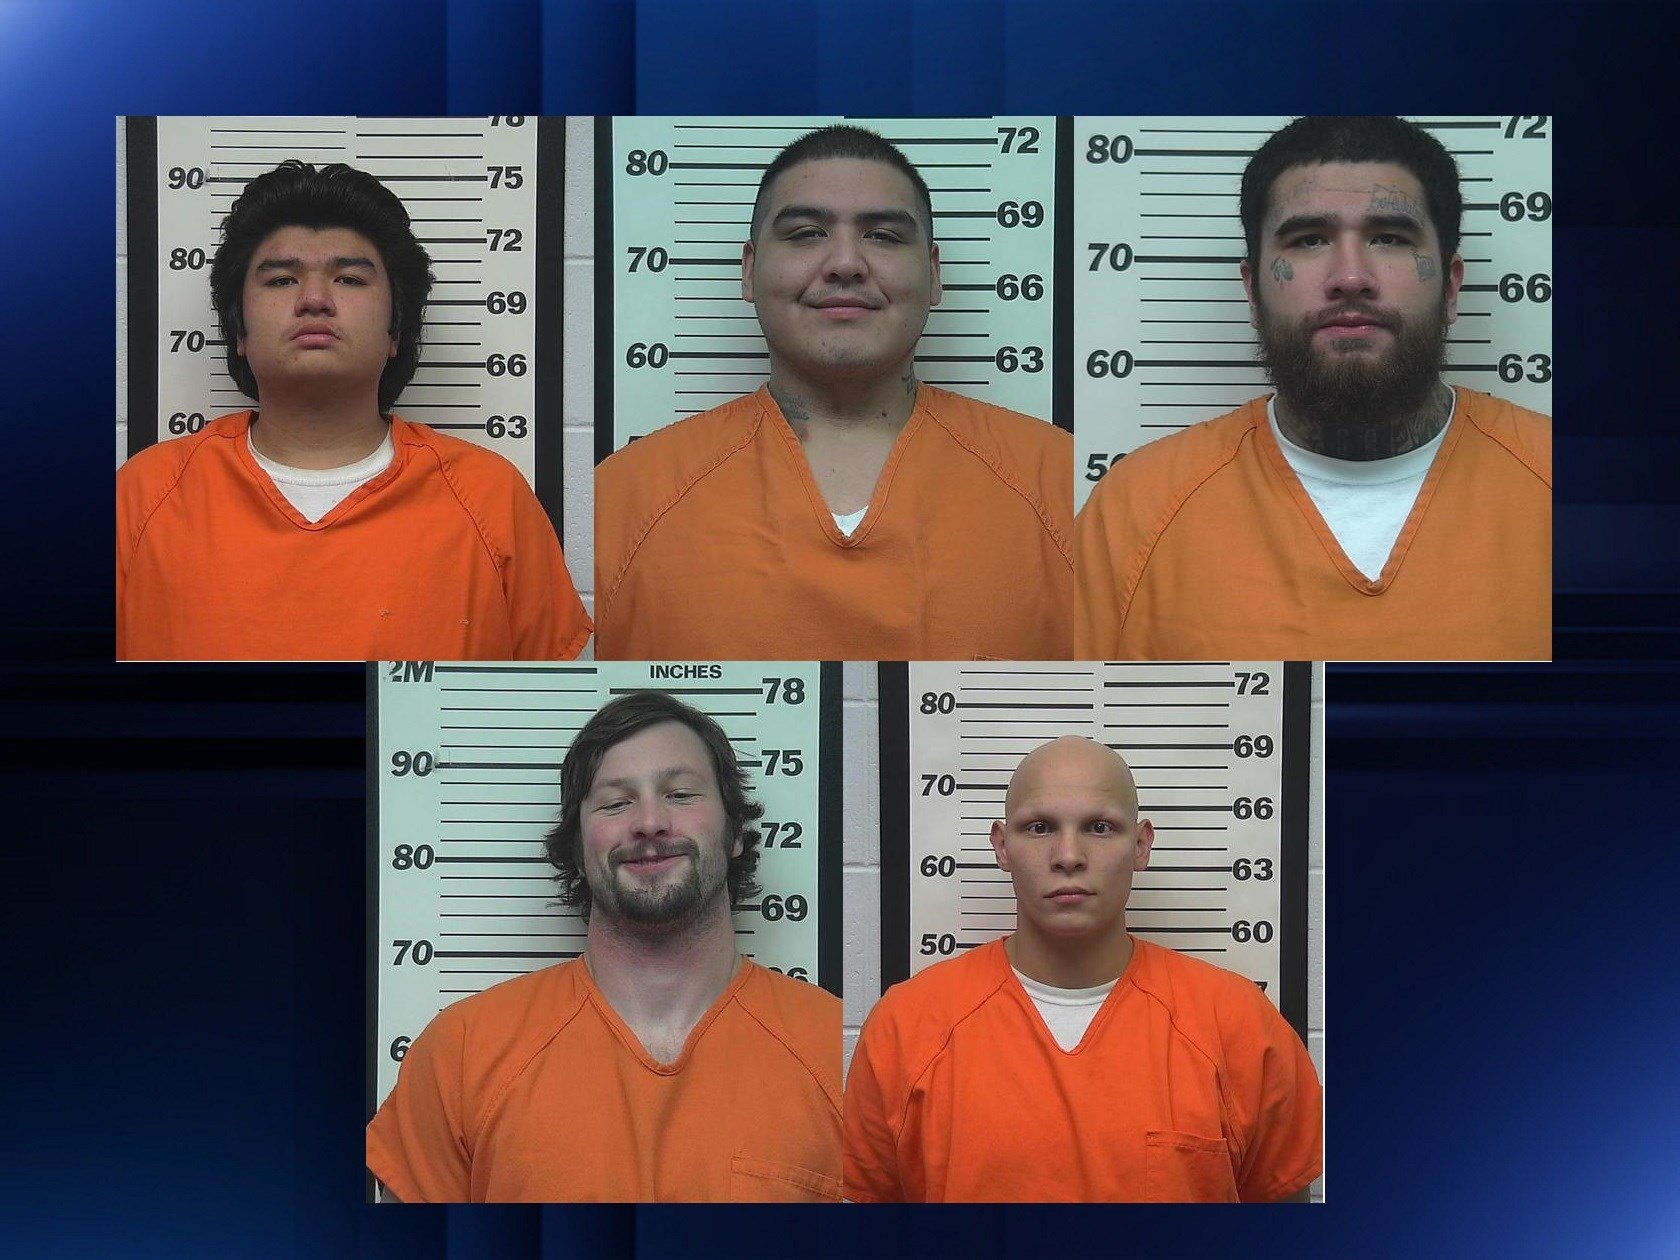 (Top Left) James Lussier, Curtis Wolfe, Joseph Lussier, (Bottom left) Evan Oungst and Richard Allen.